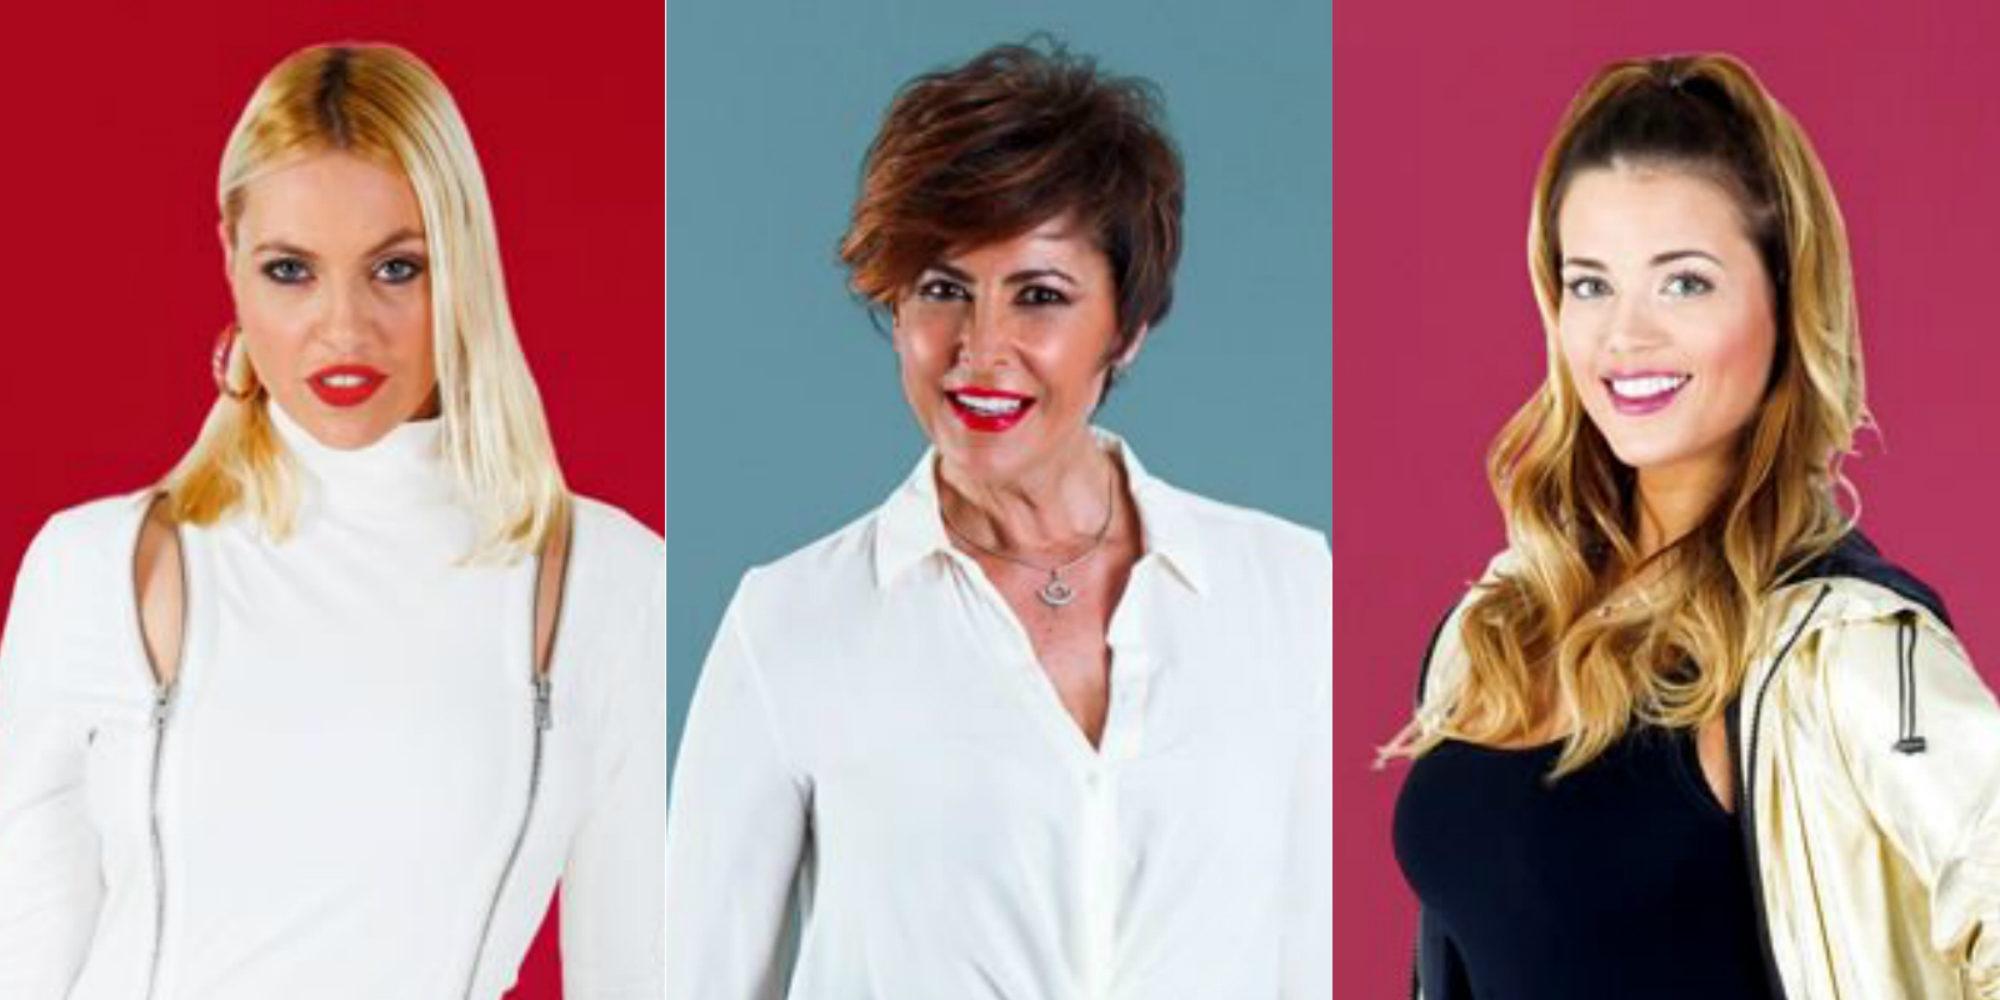 Daniela Blume, Irma Soriano o Alyson Eckmann: ¿Quién merece ganar 'Gran Hermano VIP 5'?